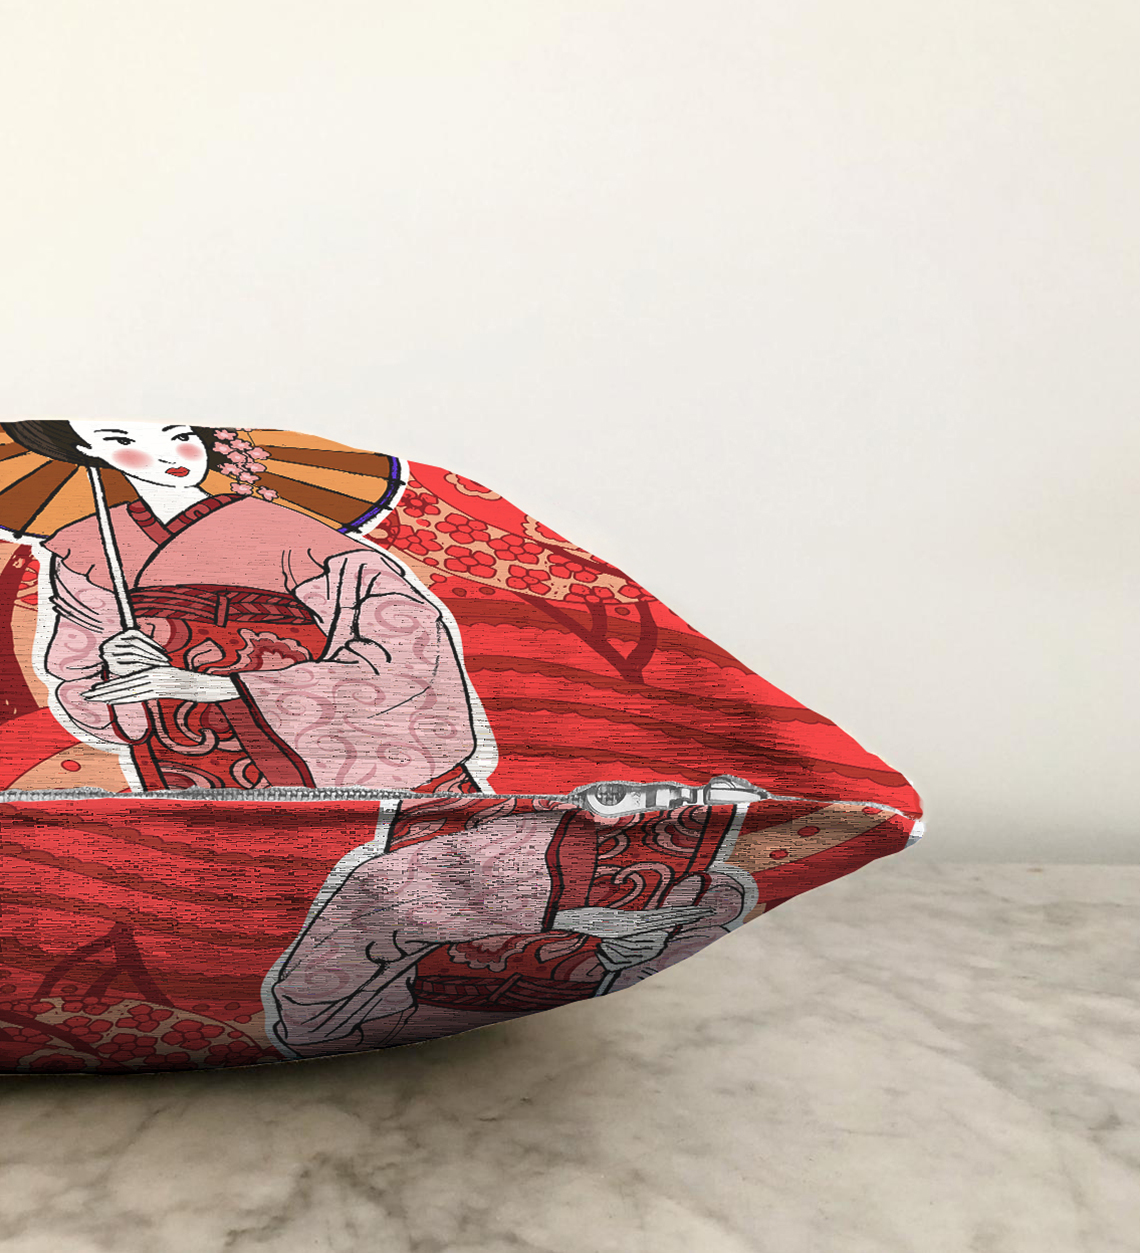 Çift Taraflı Kahverengi Şemsiyeli Japon Bayan Motifli Dijital Baskılı Şönil Kırlent Kılıfı - 55 x 55 cm Realhomes